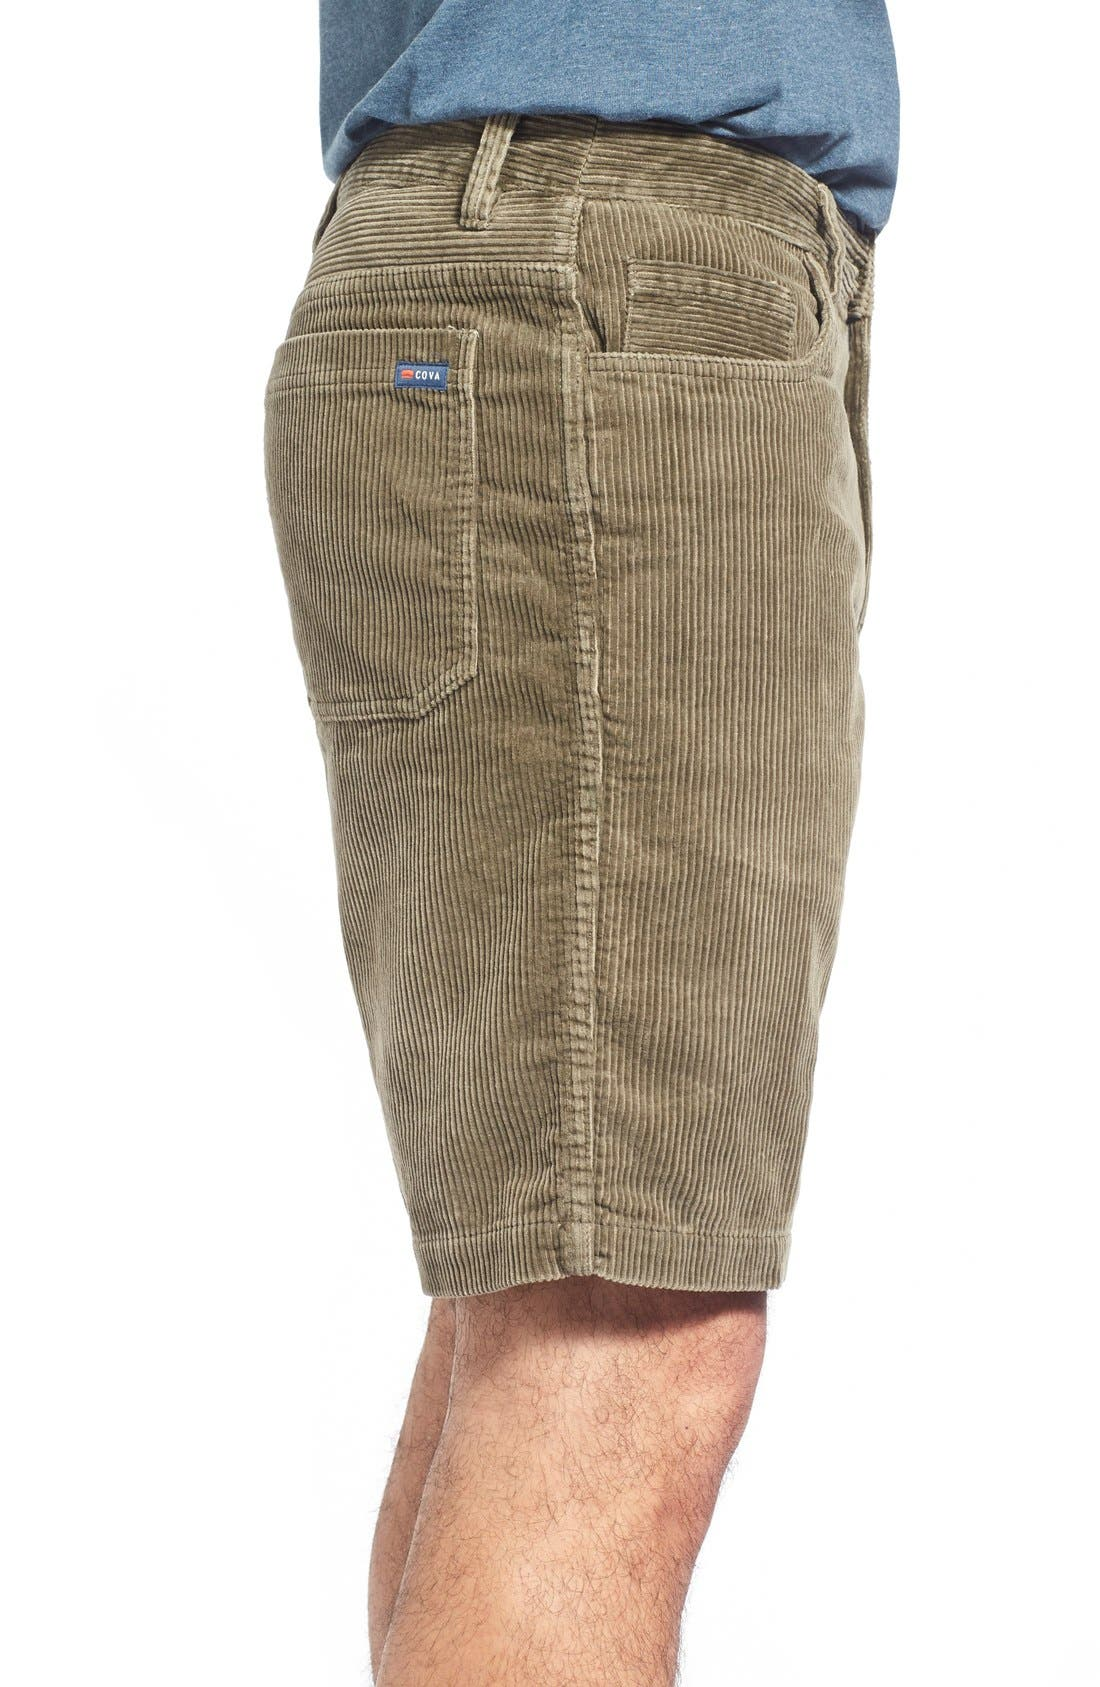 Kordo Corduroy Walking Shorts,                             Alternate thumbnail 13, color,